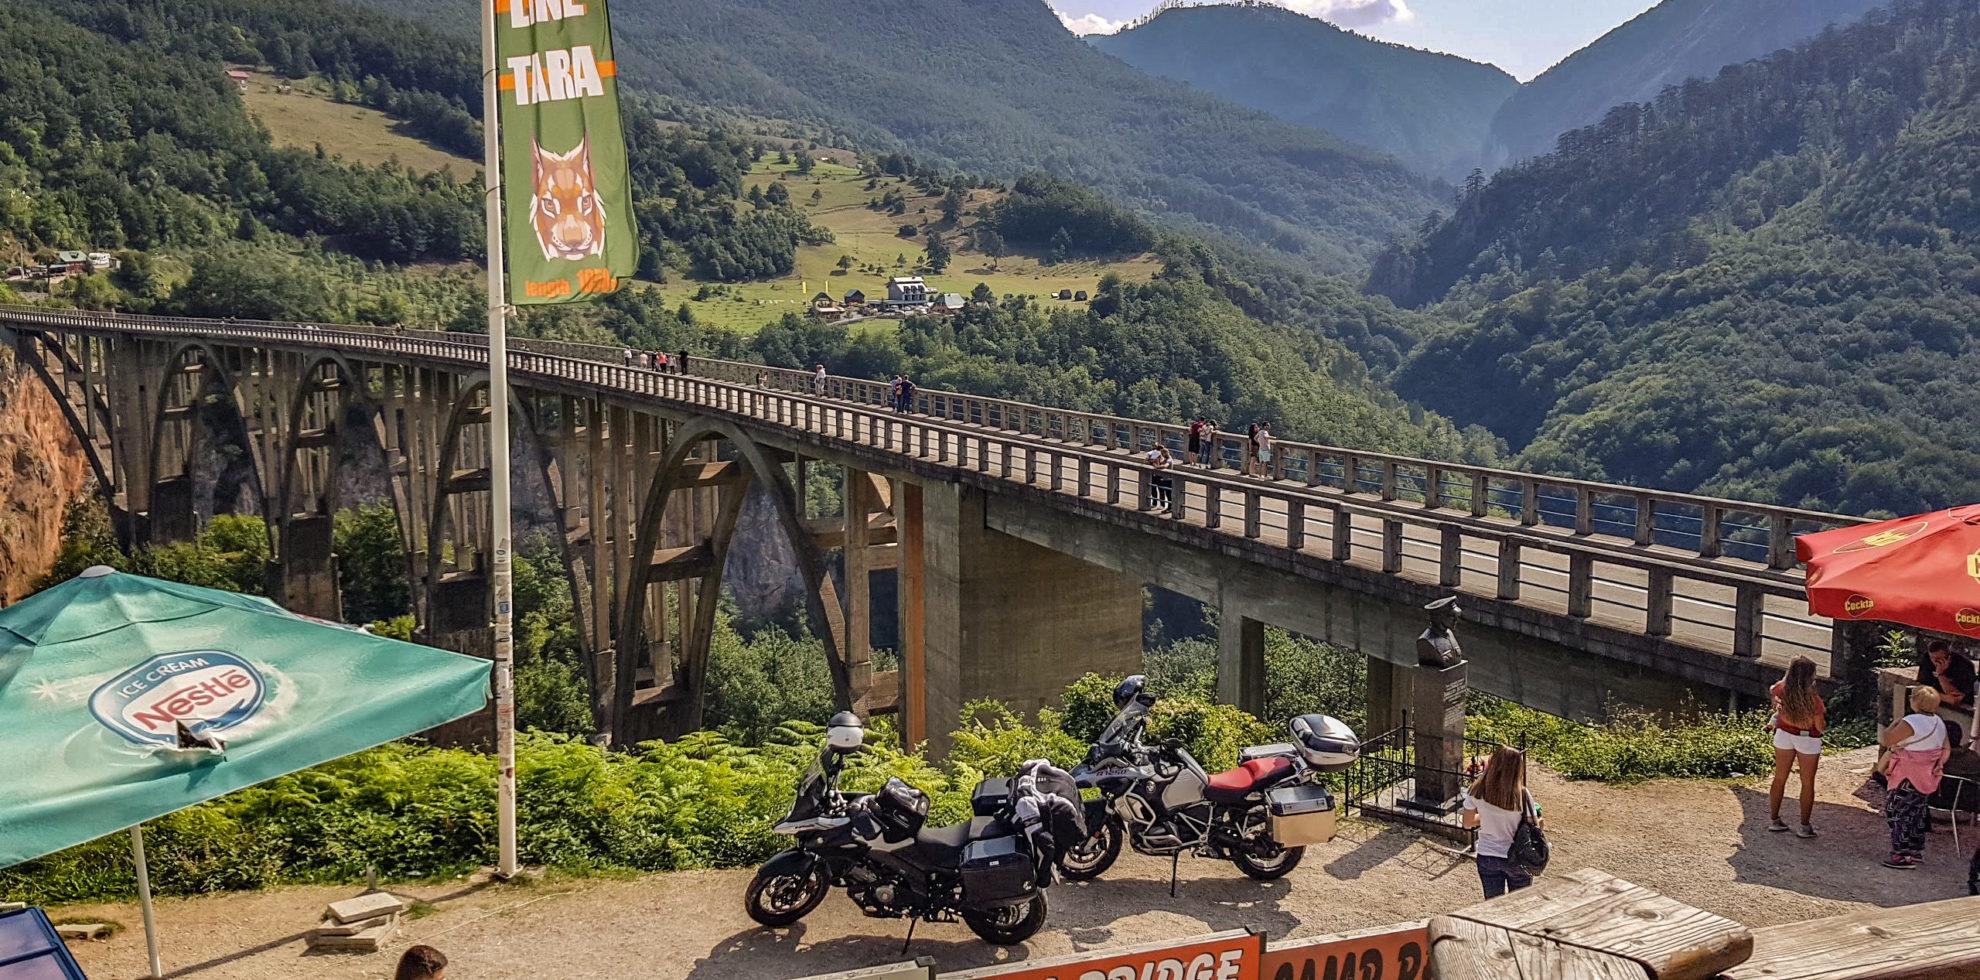 From Croatia to Montenegro motorcycle tour